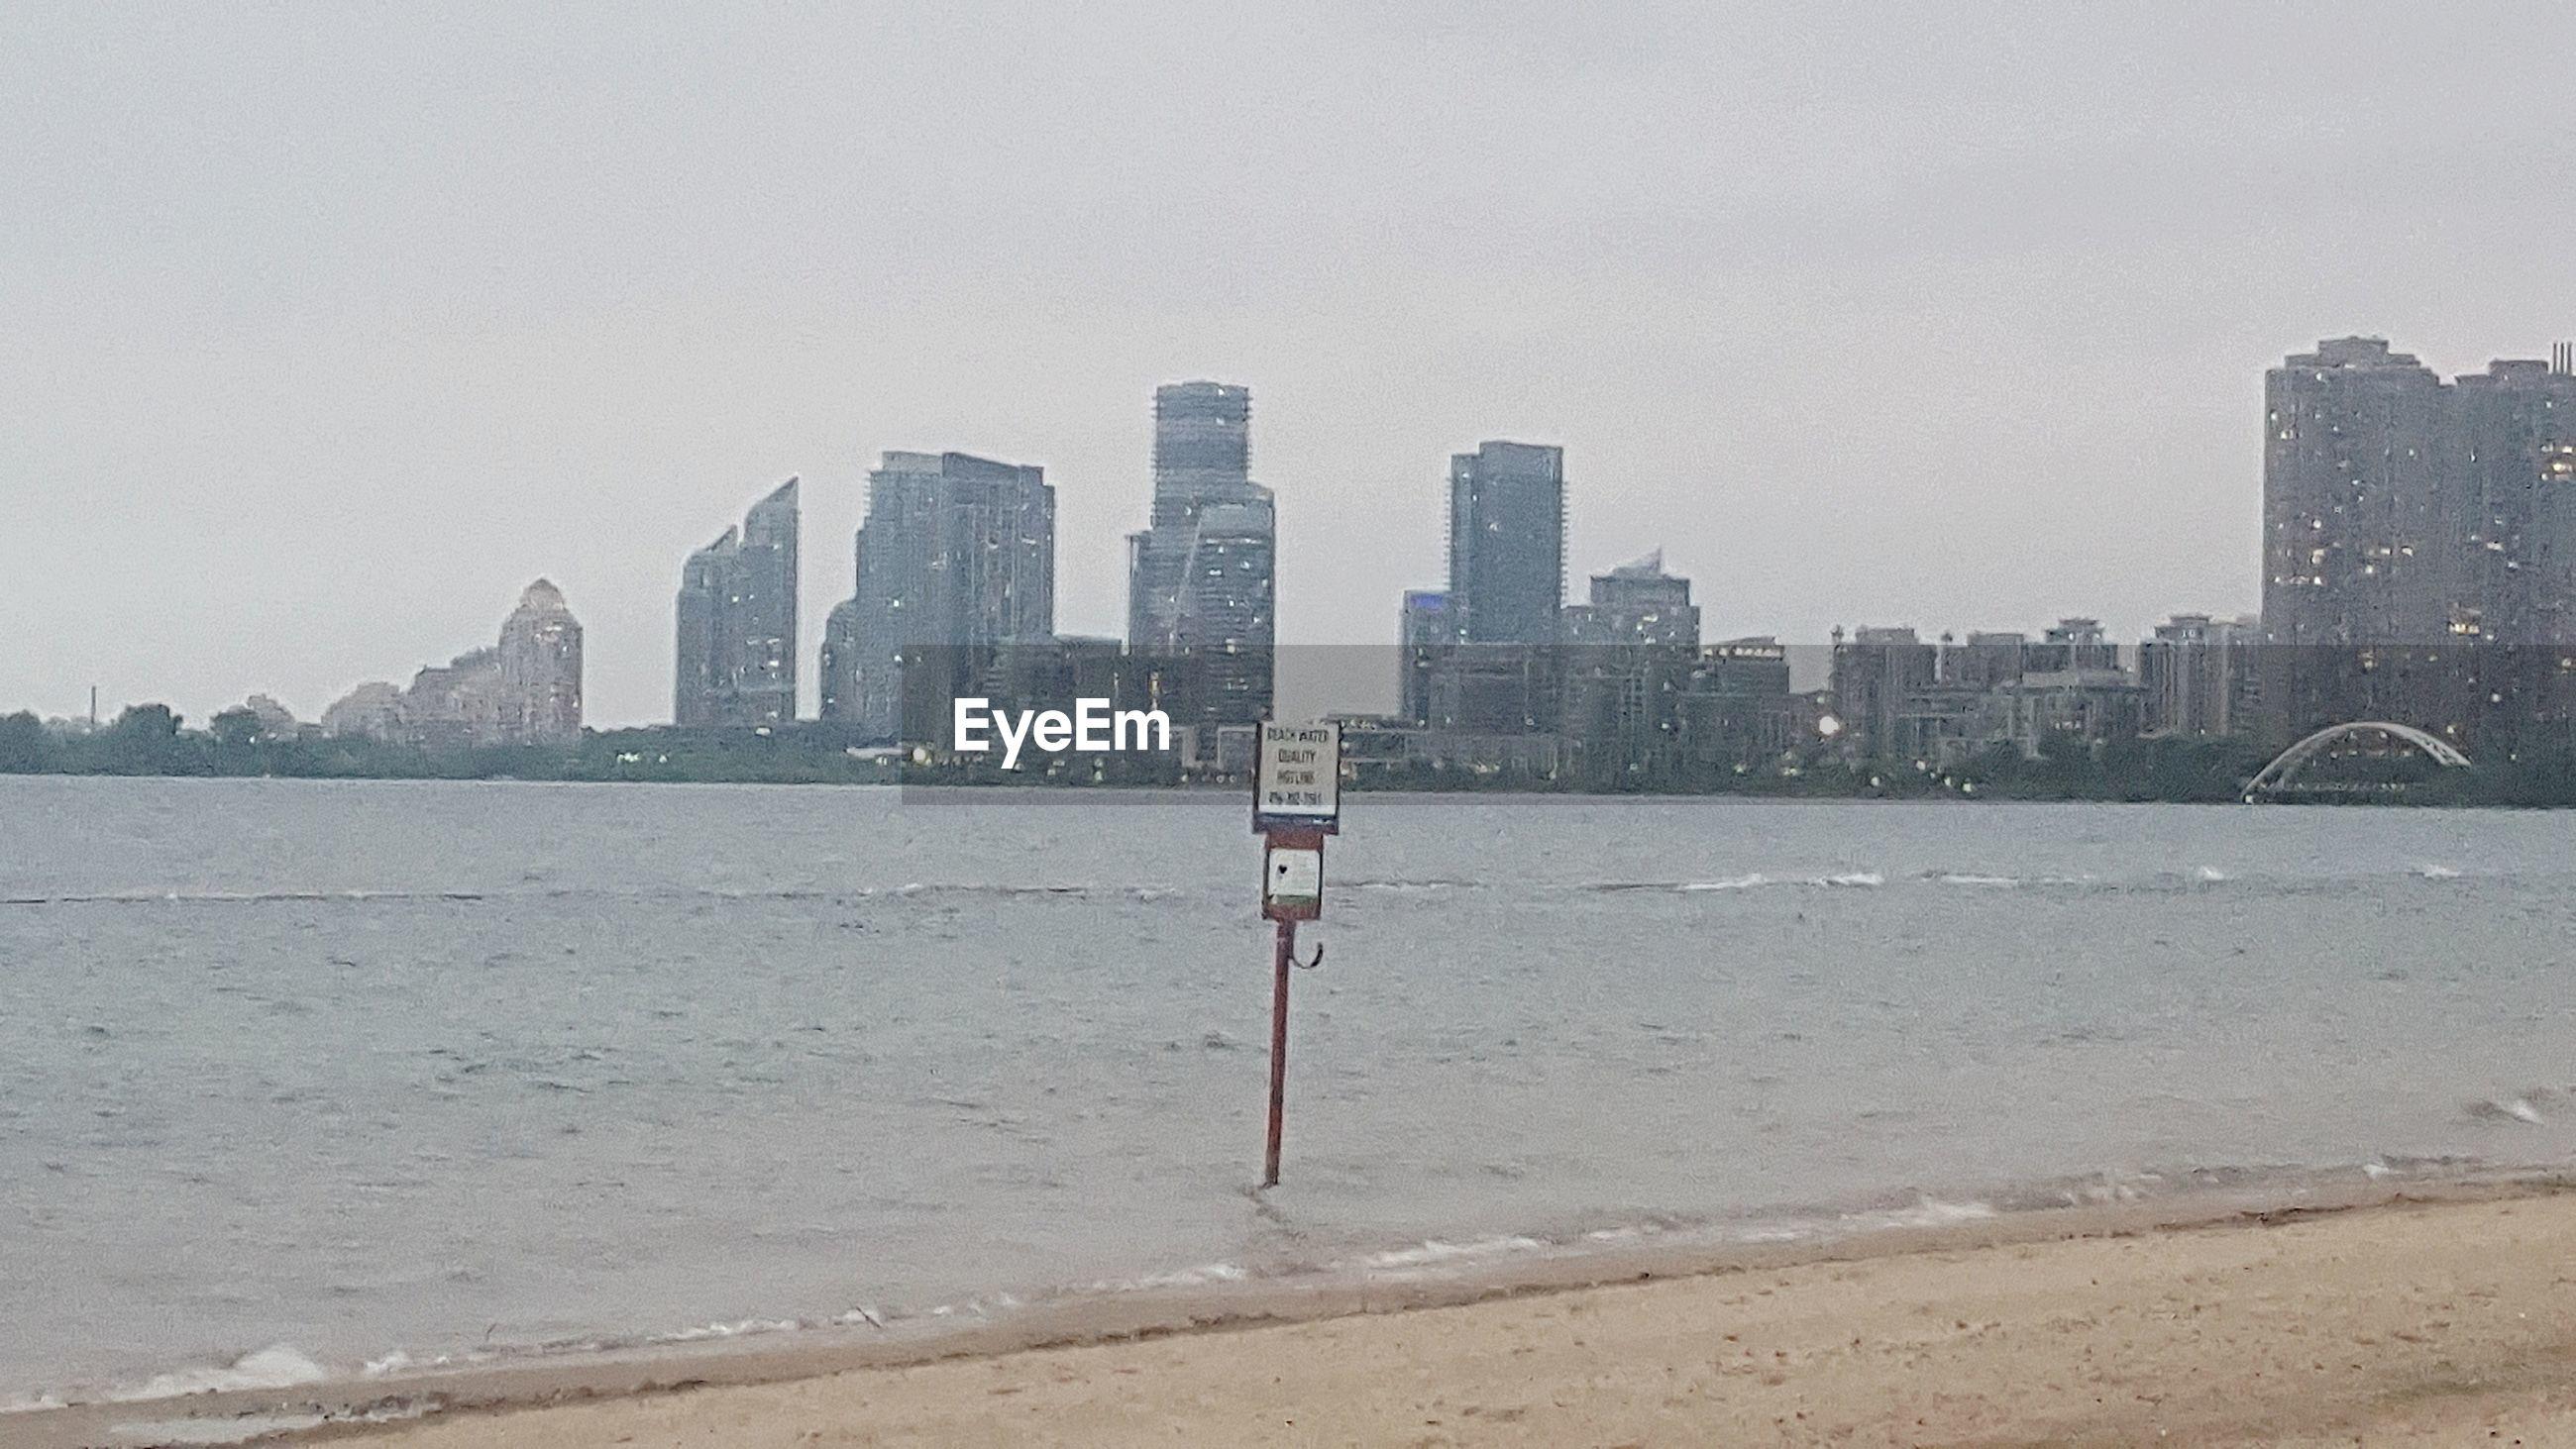 SEA AGAINST SKY IN CITY